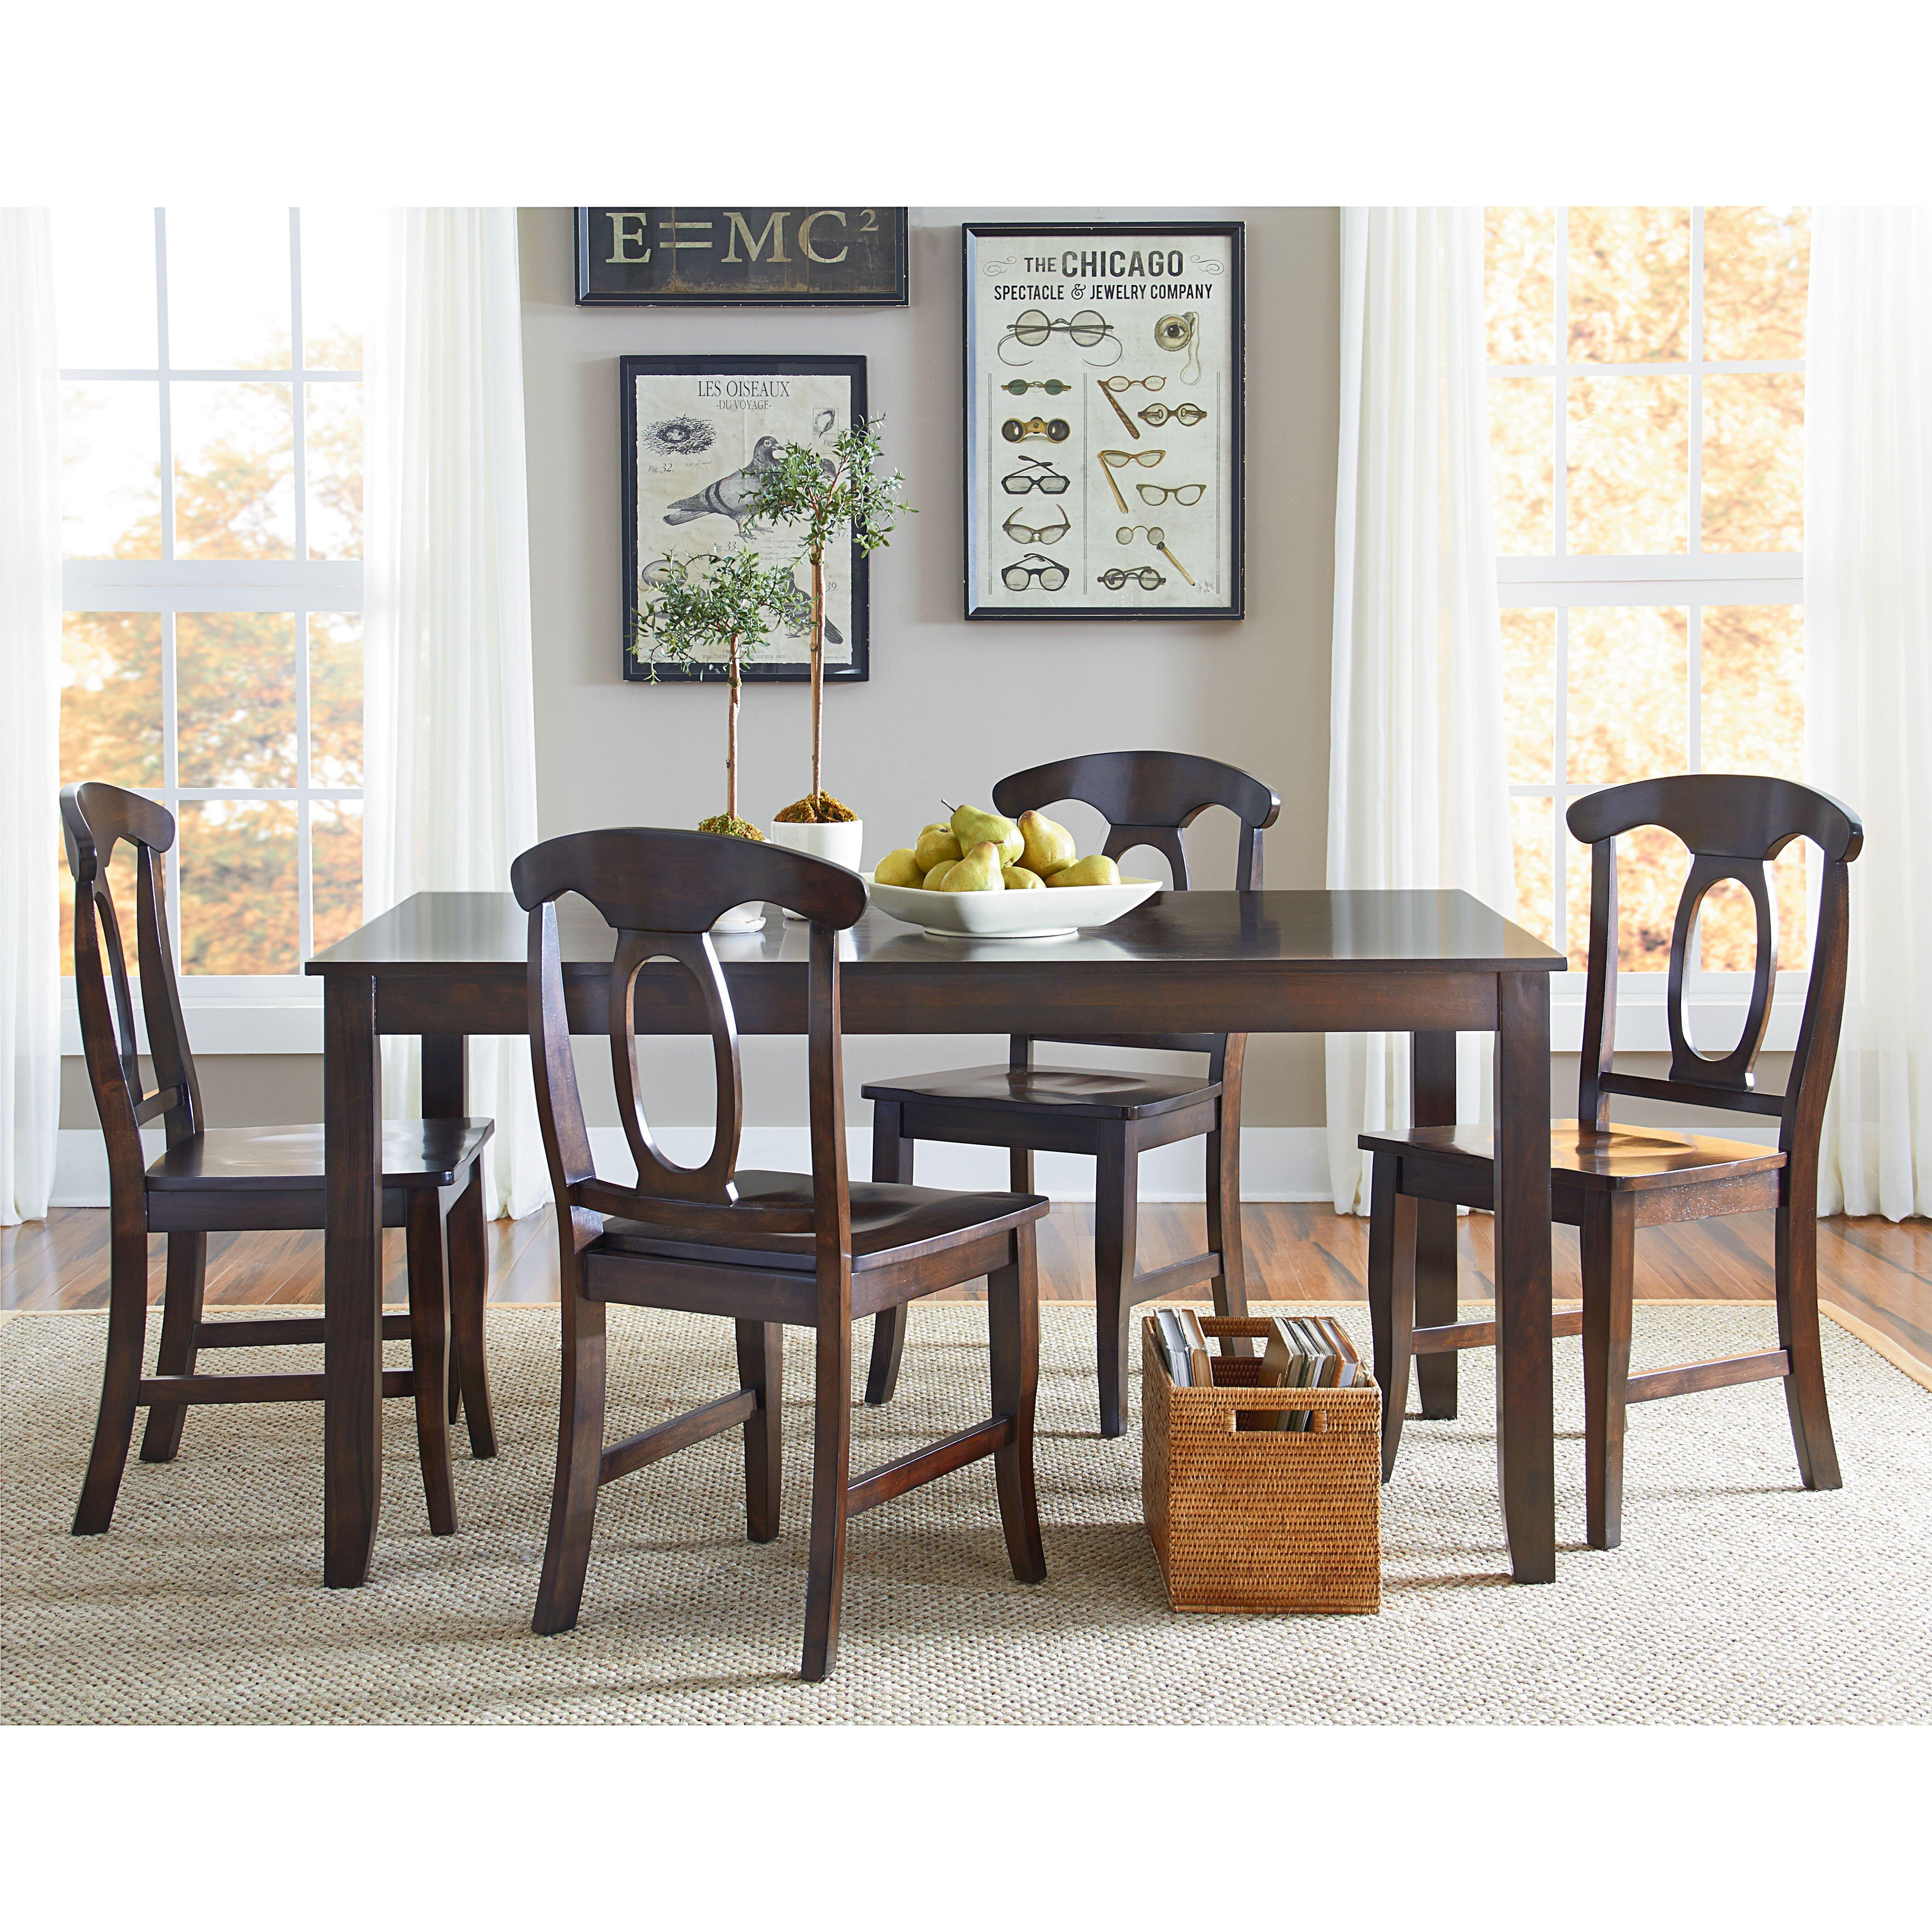 Standard Furniture Larkin 5 Piece Dining Set & Reviews